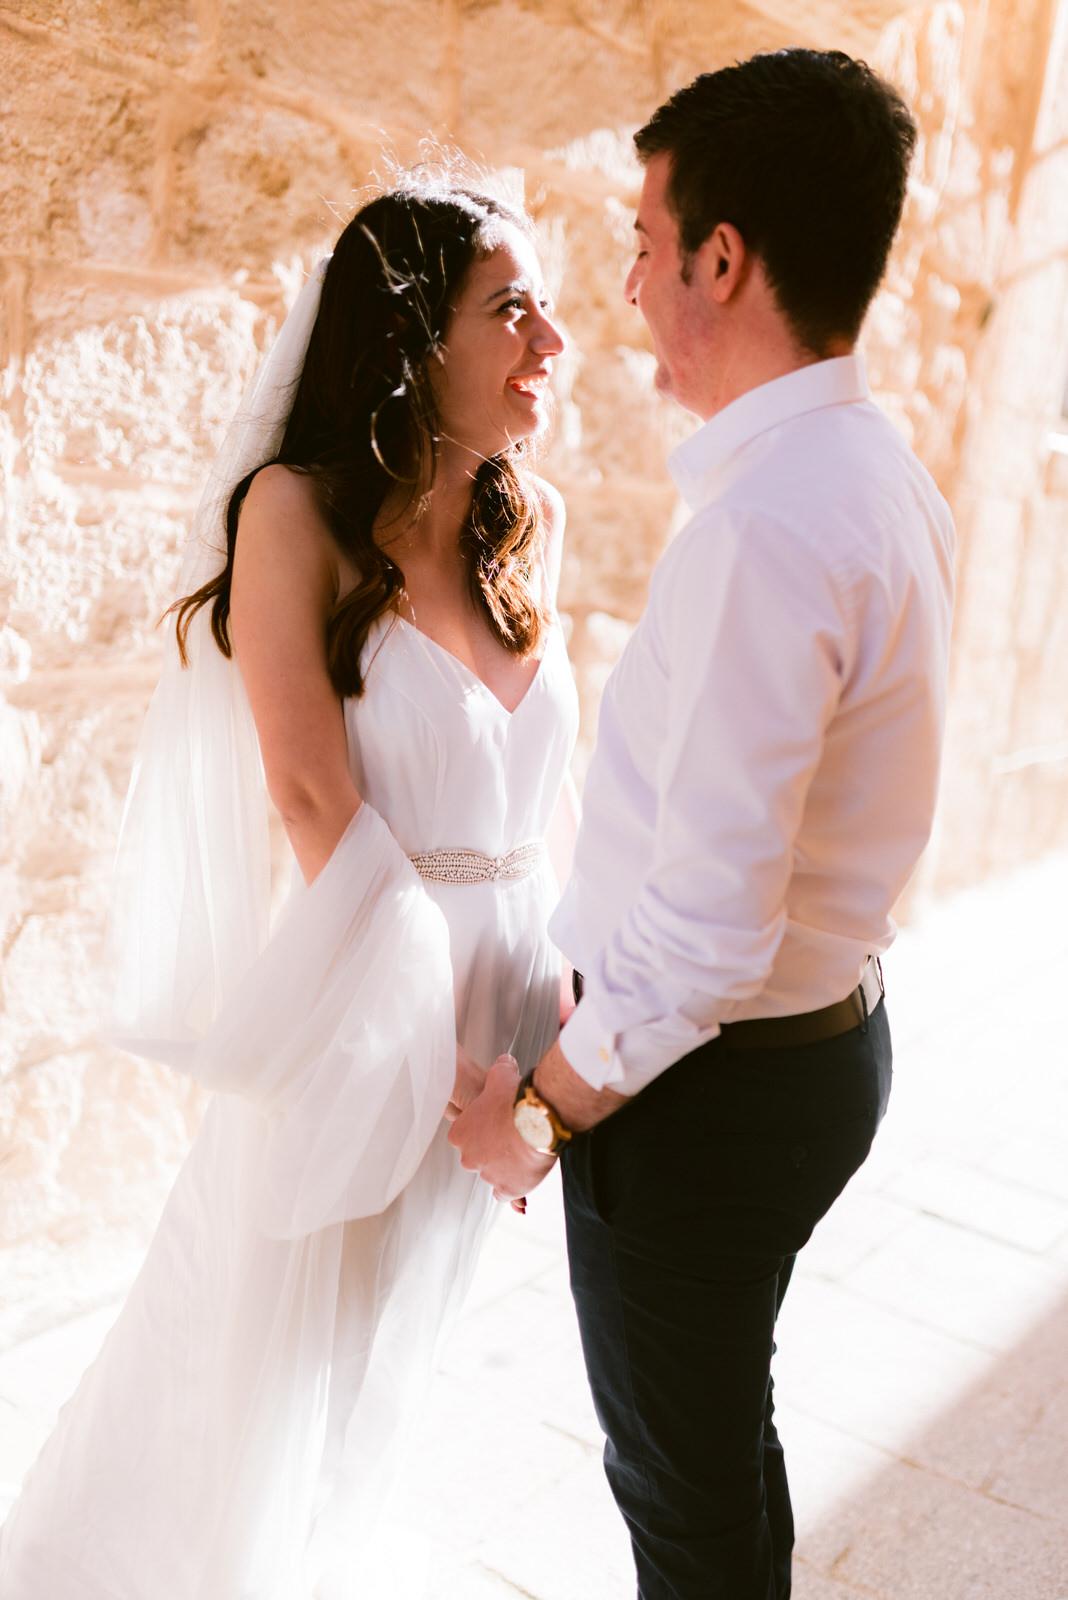 mdina wedding, malta wedding photography, malta elopement, golden bay malta wedding photos, wedding photographer malta, malta wedding venue, villa bologna wedding (50).jpg